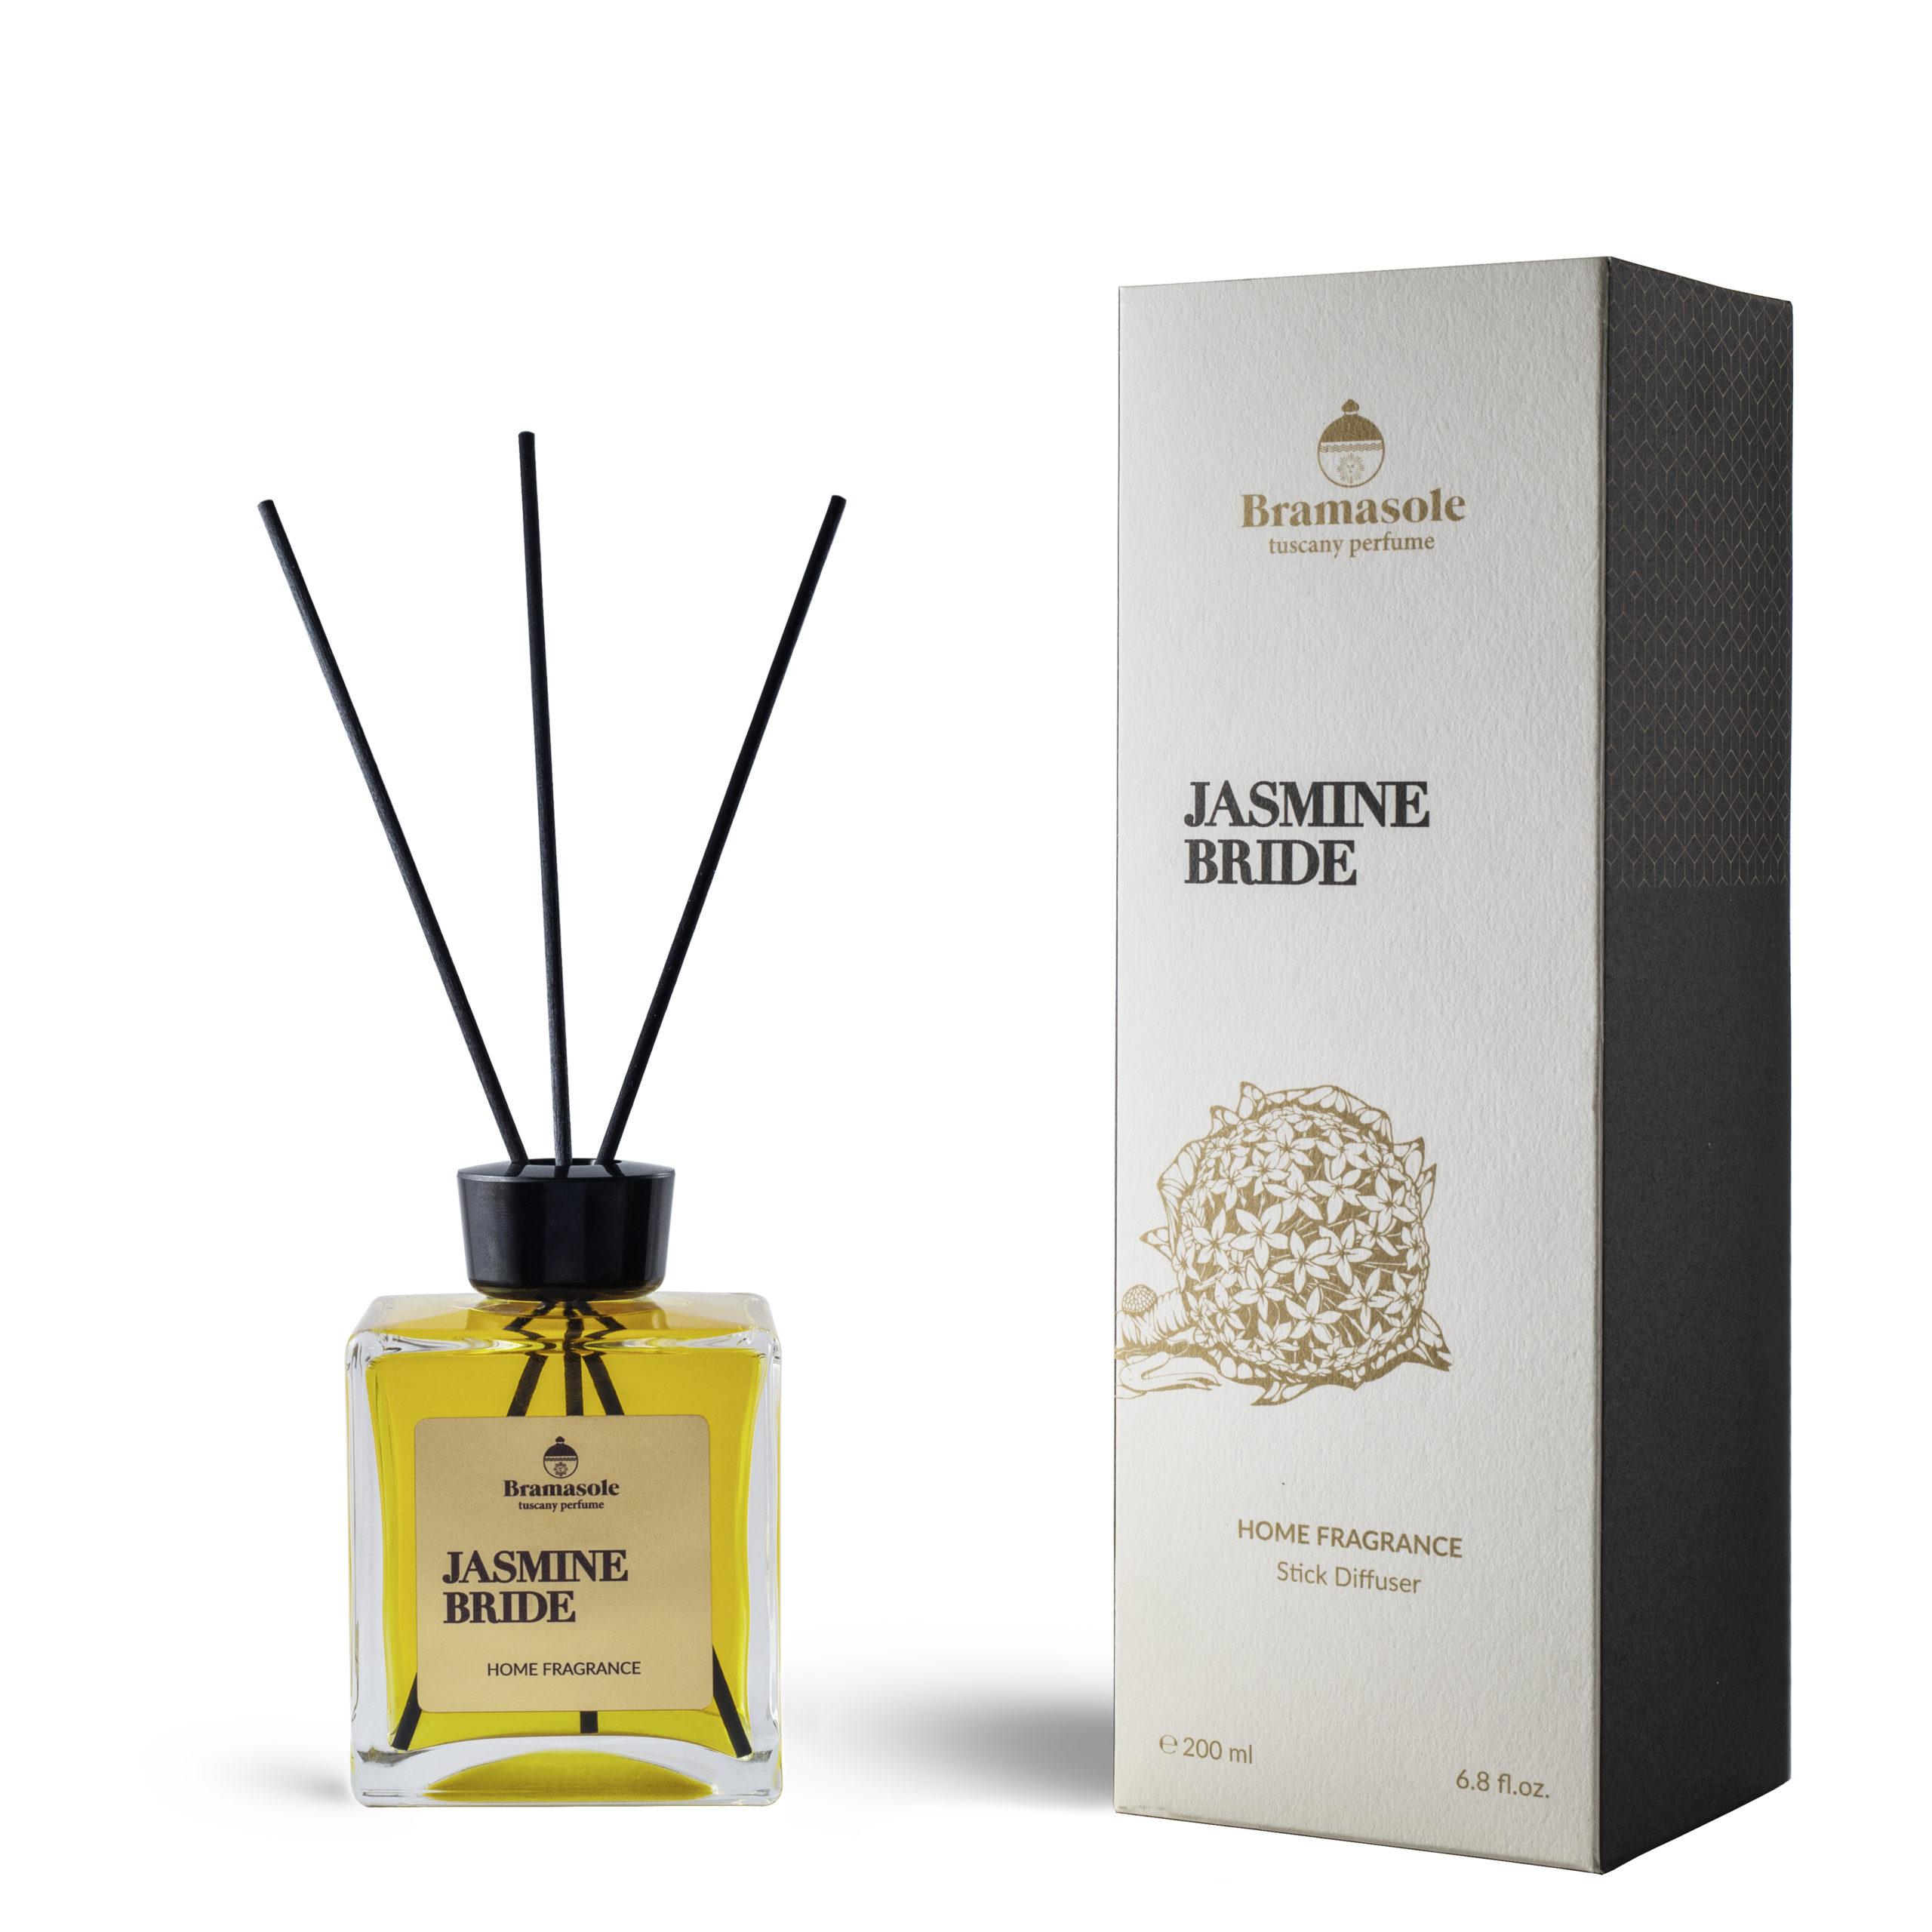 Jasmine Bride – home fragrance